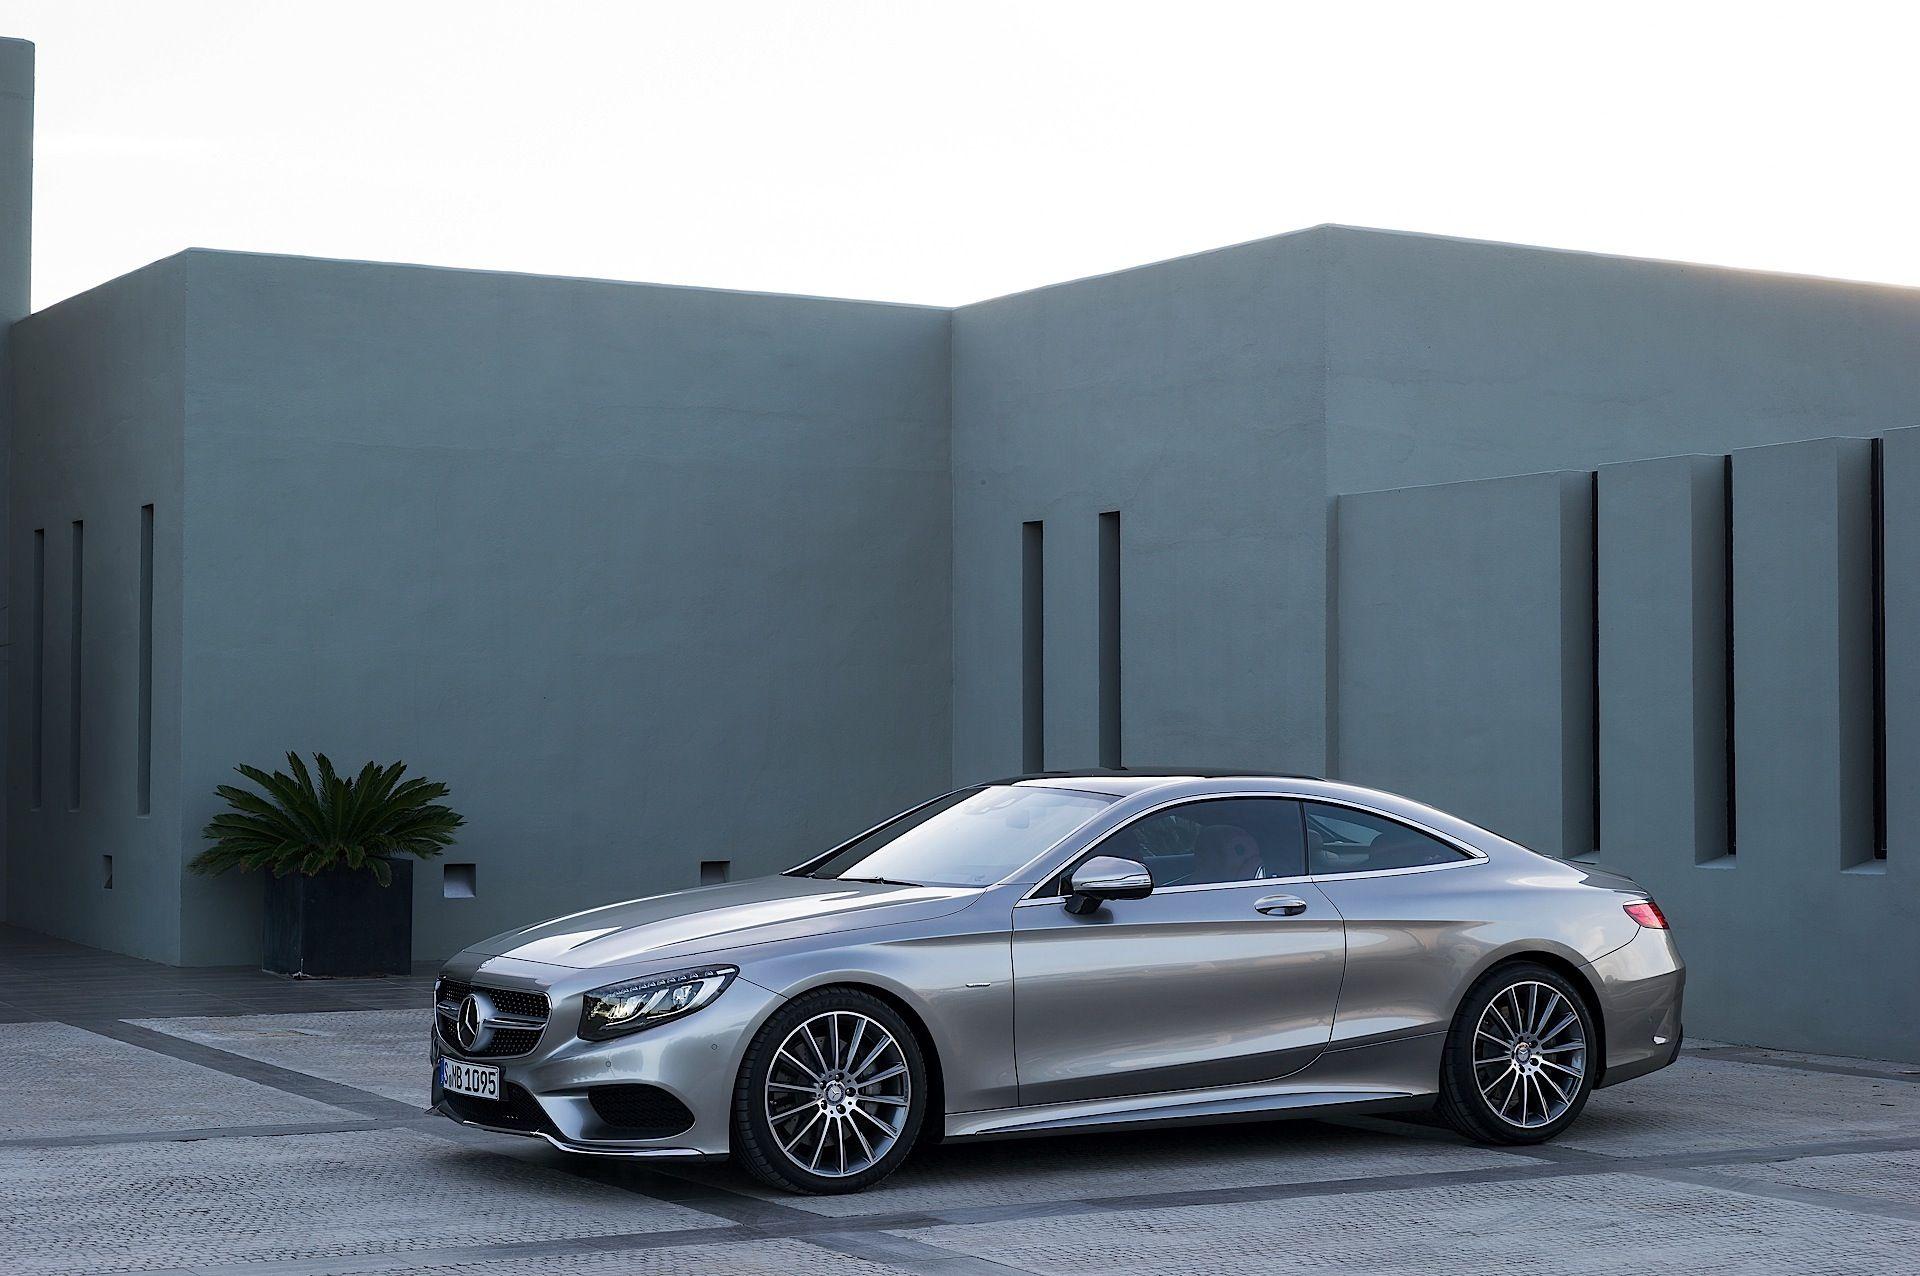 Best 20 Mercedes benz c klasse ideas on Pinterest